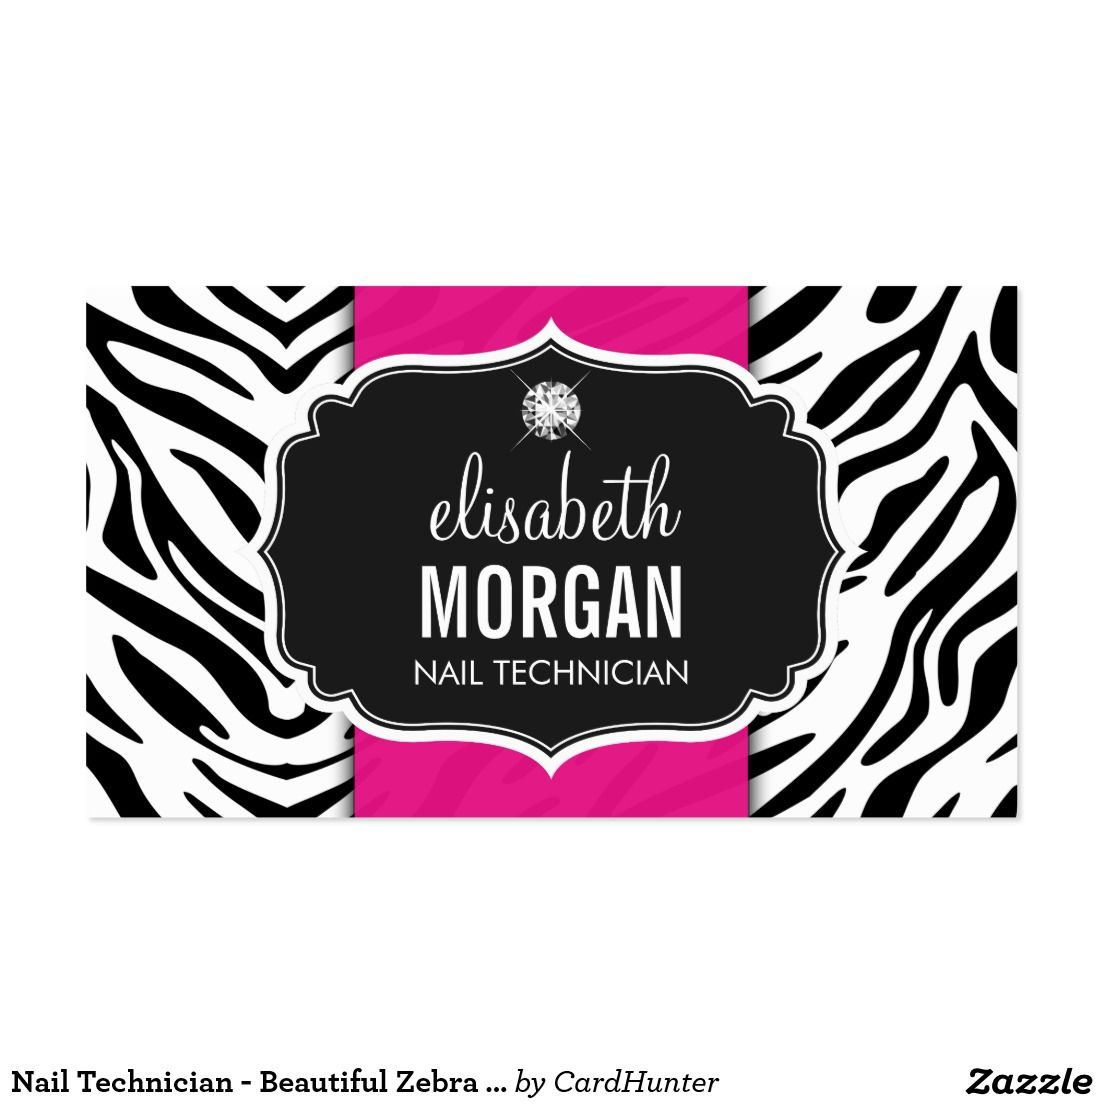 Nail Technician - Beautiful Zebra Print Business Card | Zebra print ...